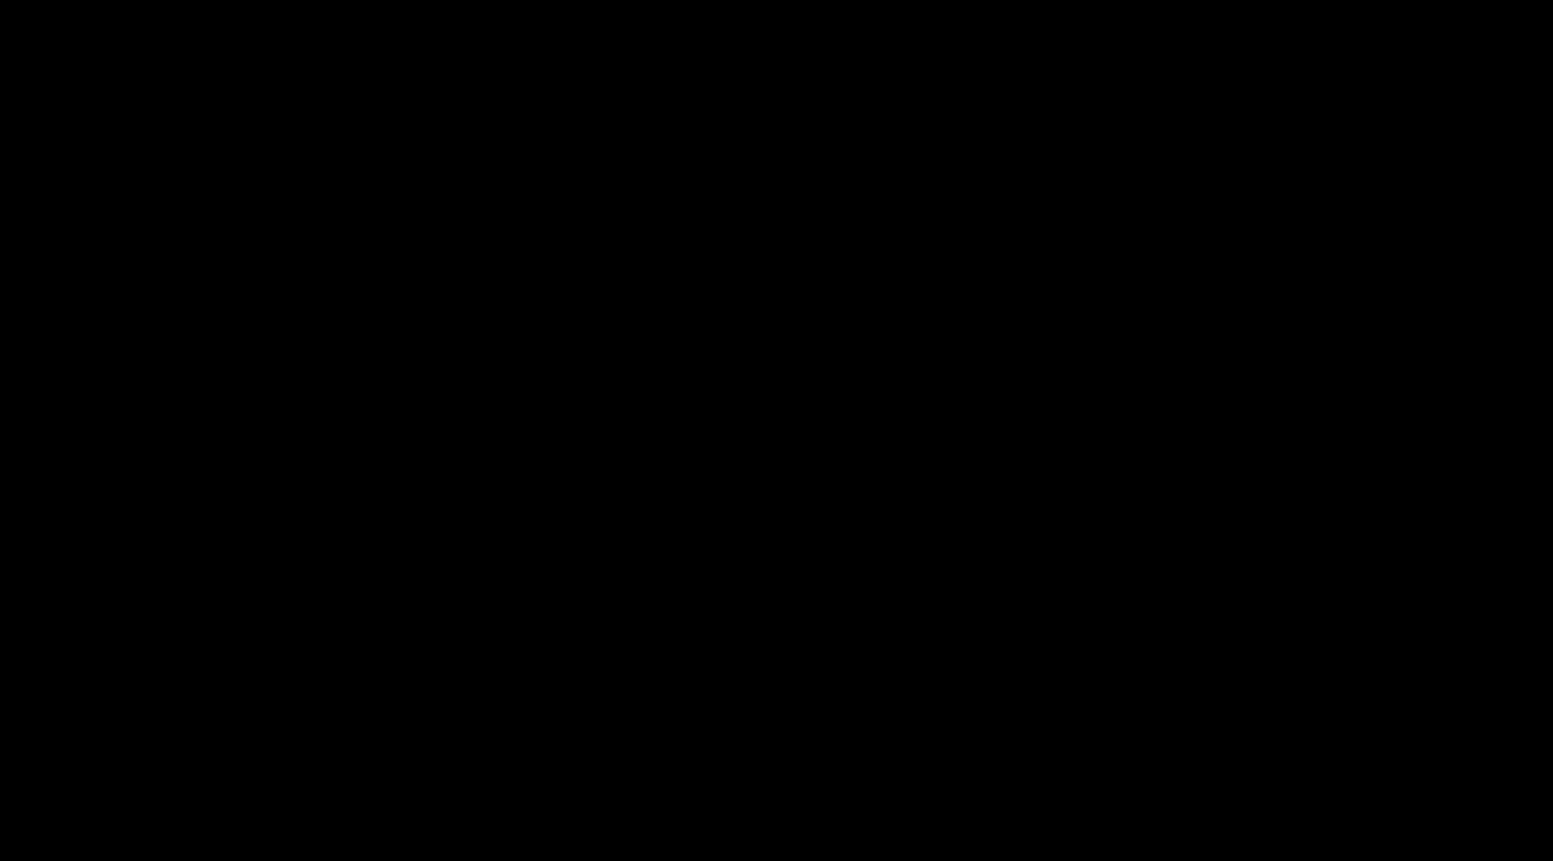 logo-john-john-png-8